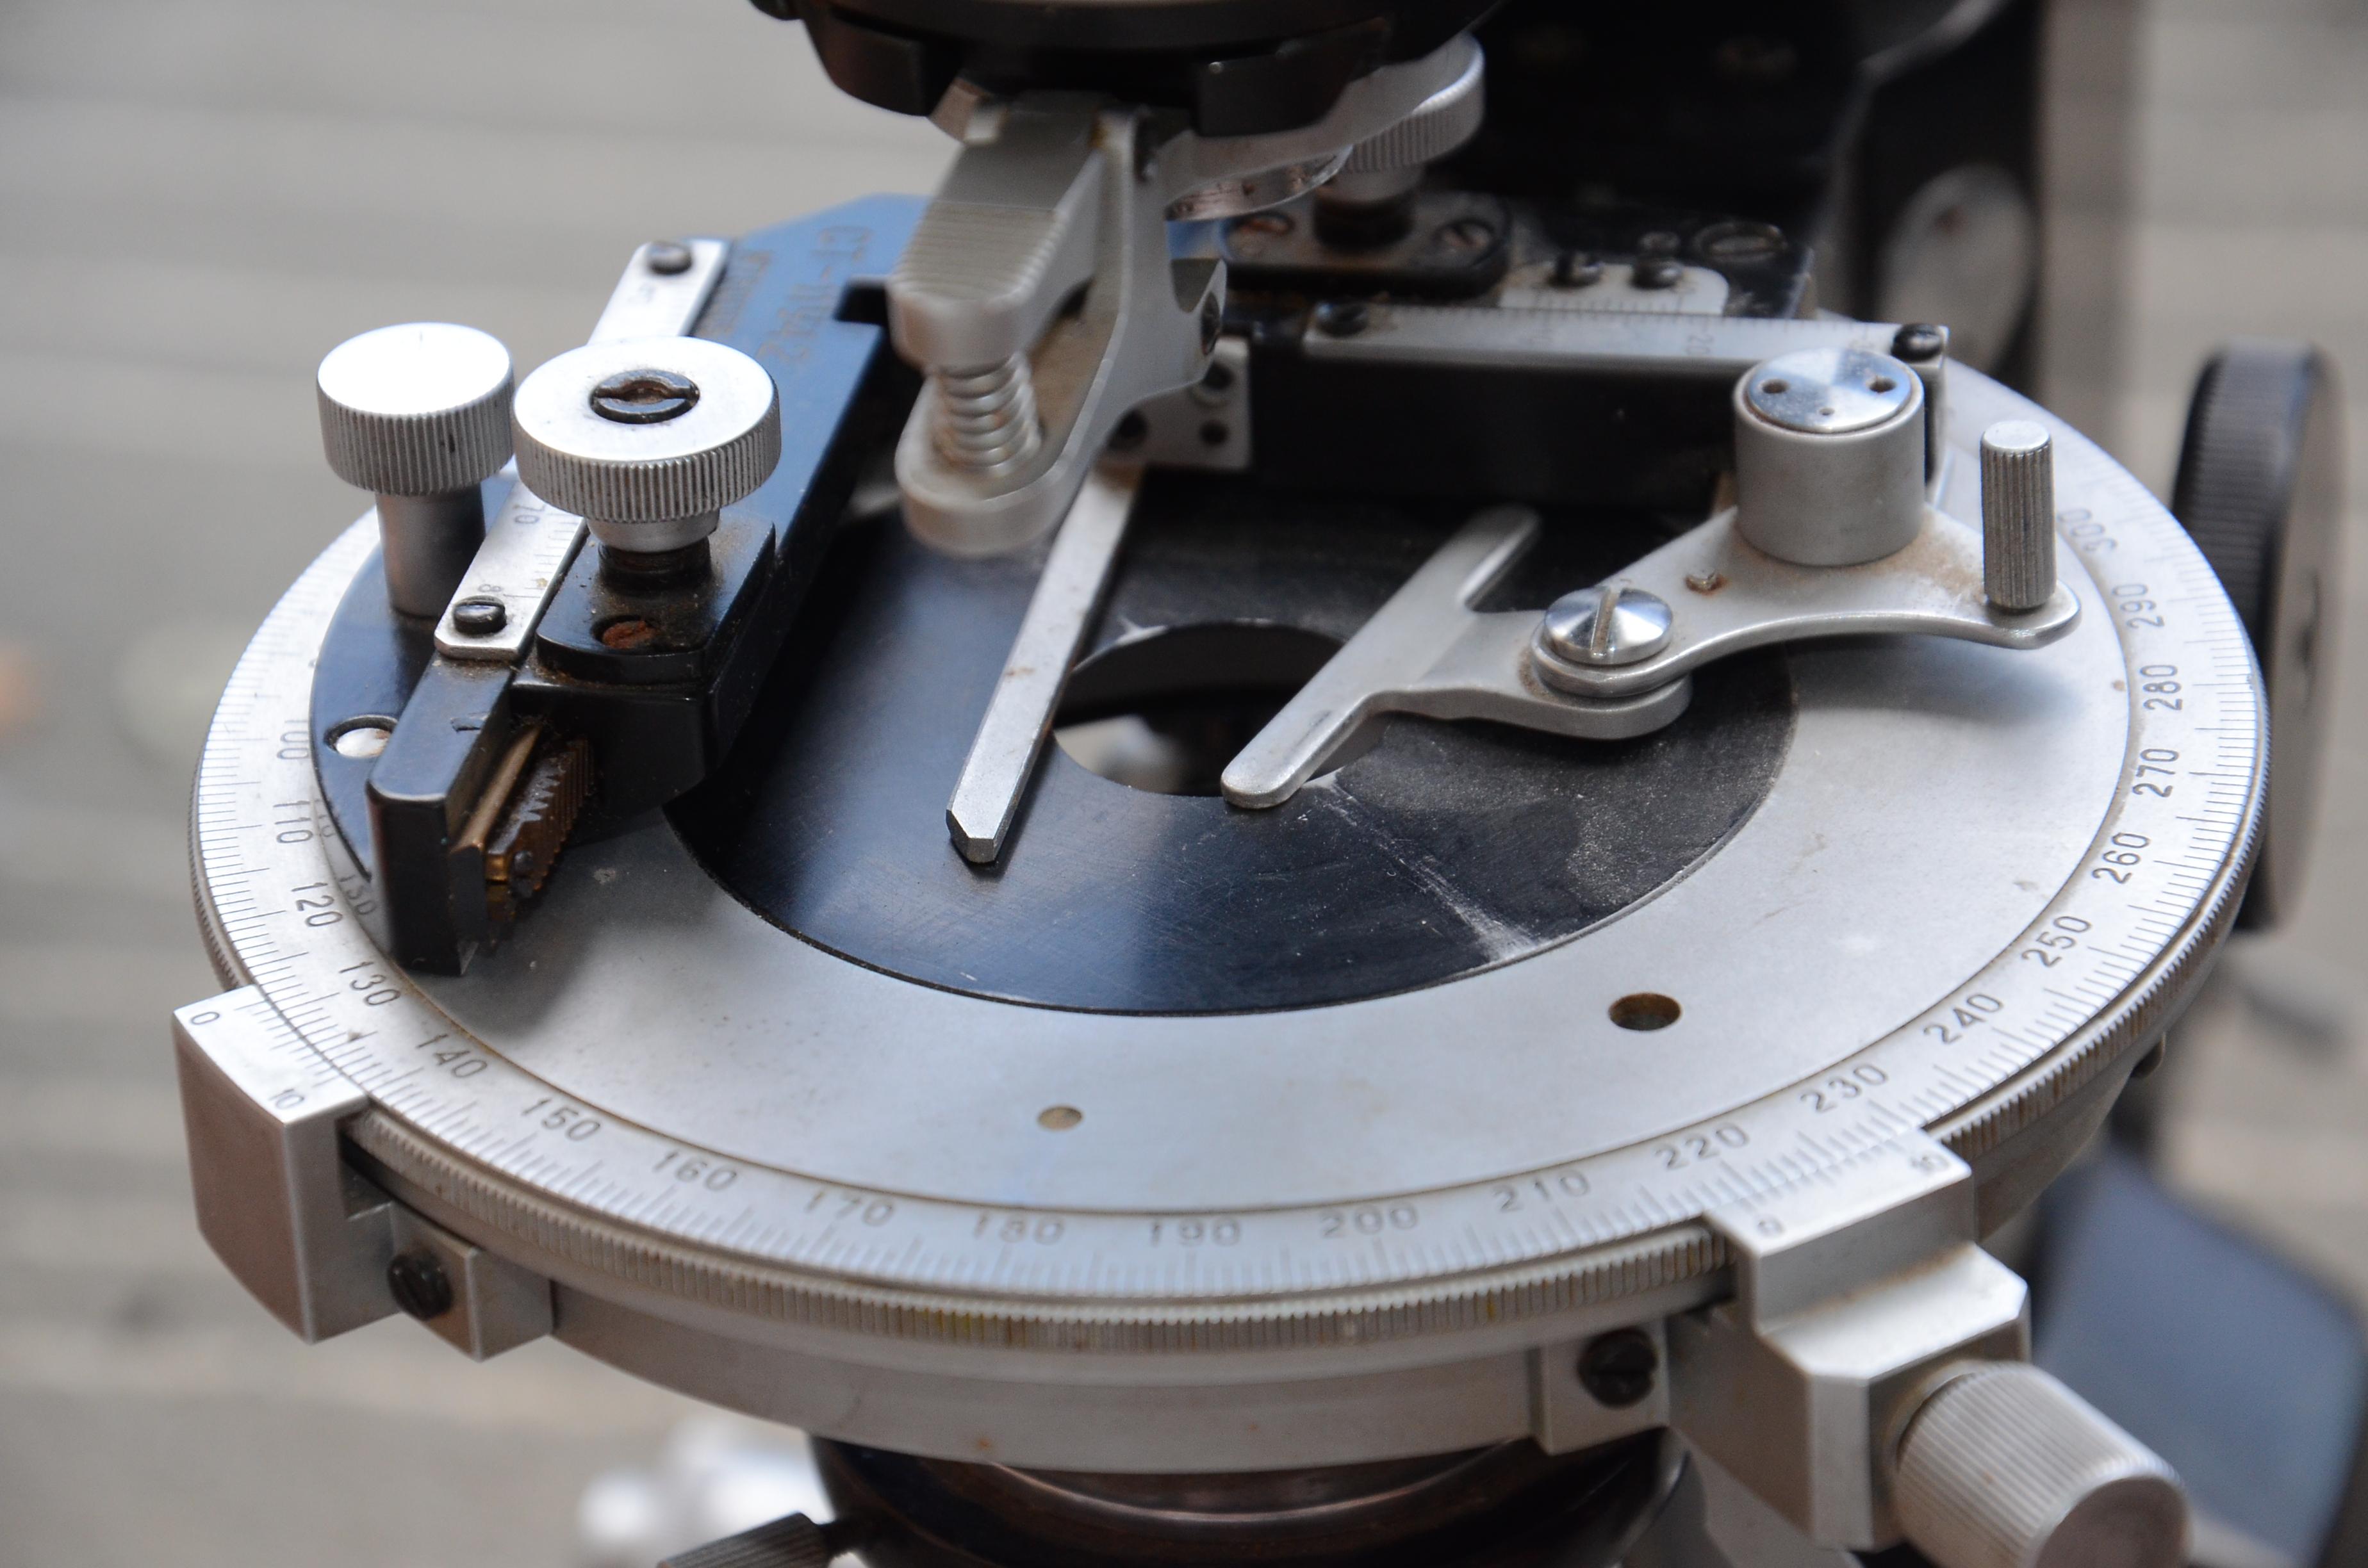 микроскоп мин-8 столик фото